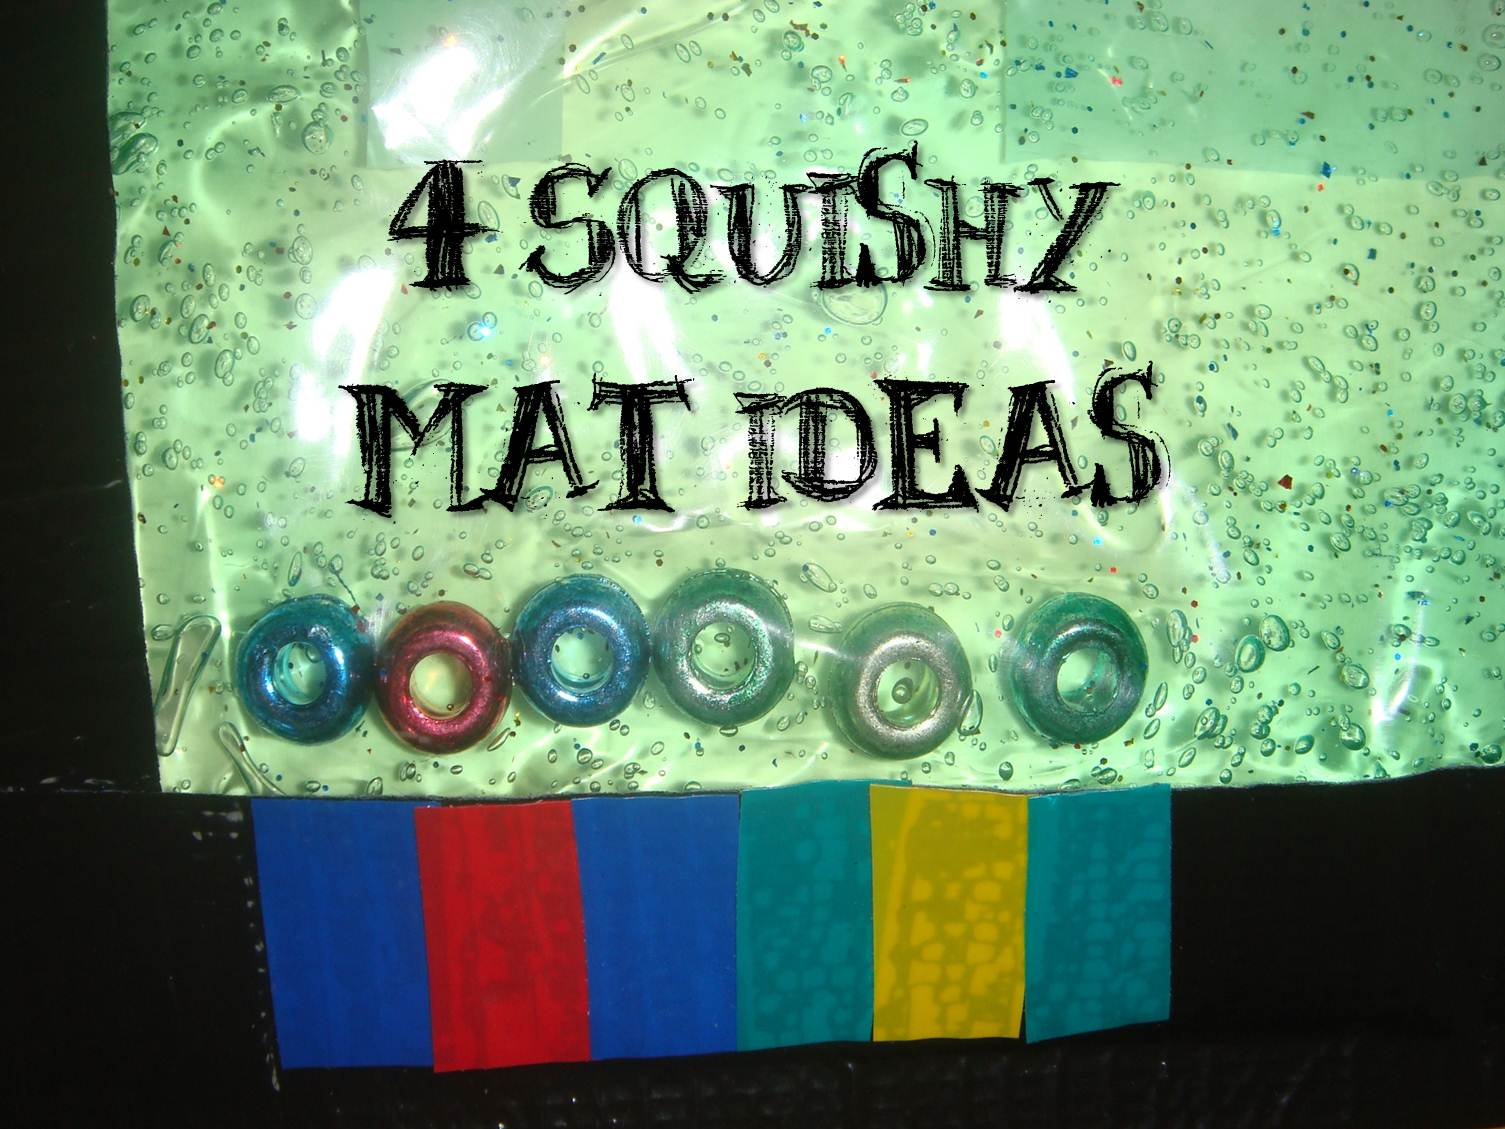 Making boys men 4 squishy mat ideas for Squishy ideas